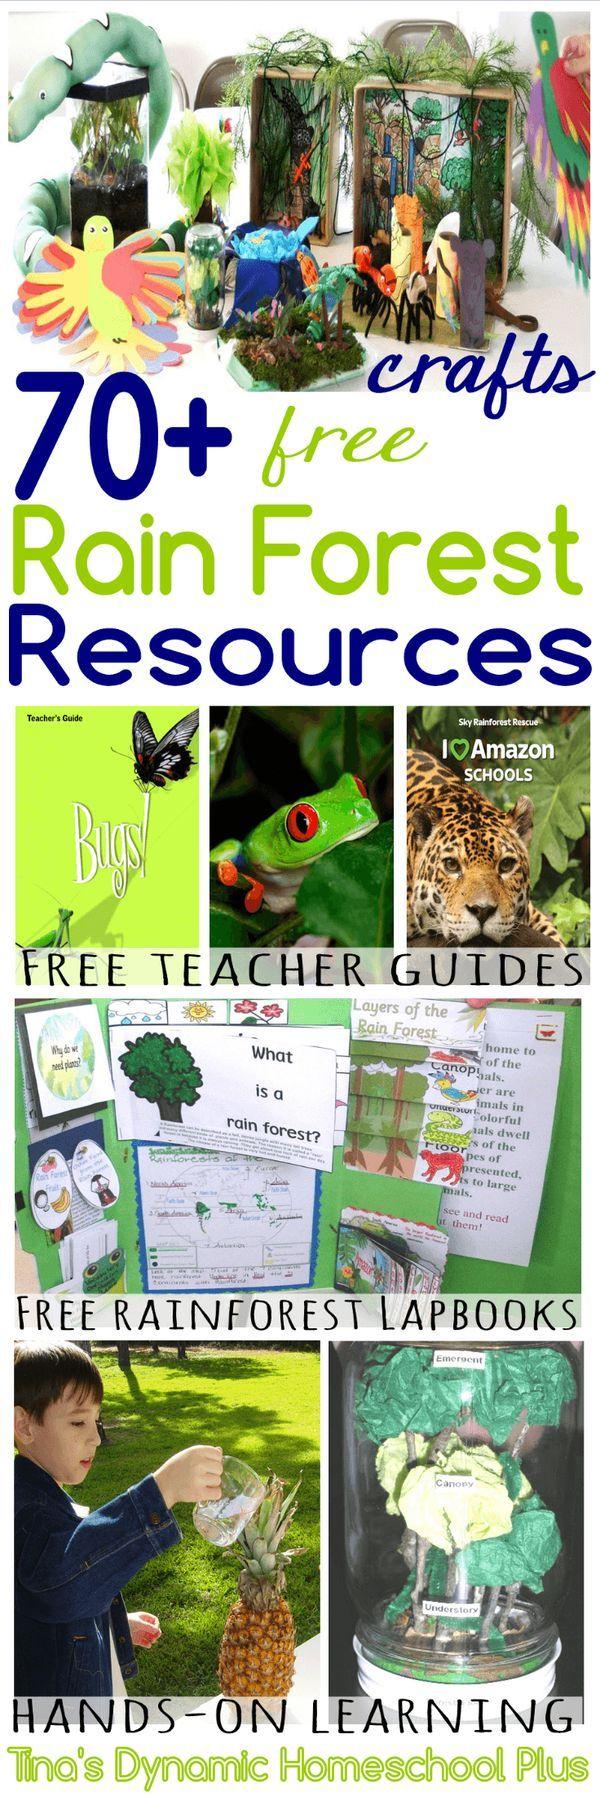 70+ Free Rain Forest Resources  Teacher Guides, Crafts, Lapbooks |Tina's Dynamic Homeschool Plus